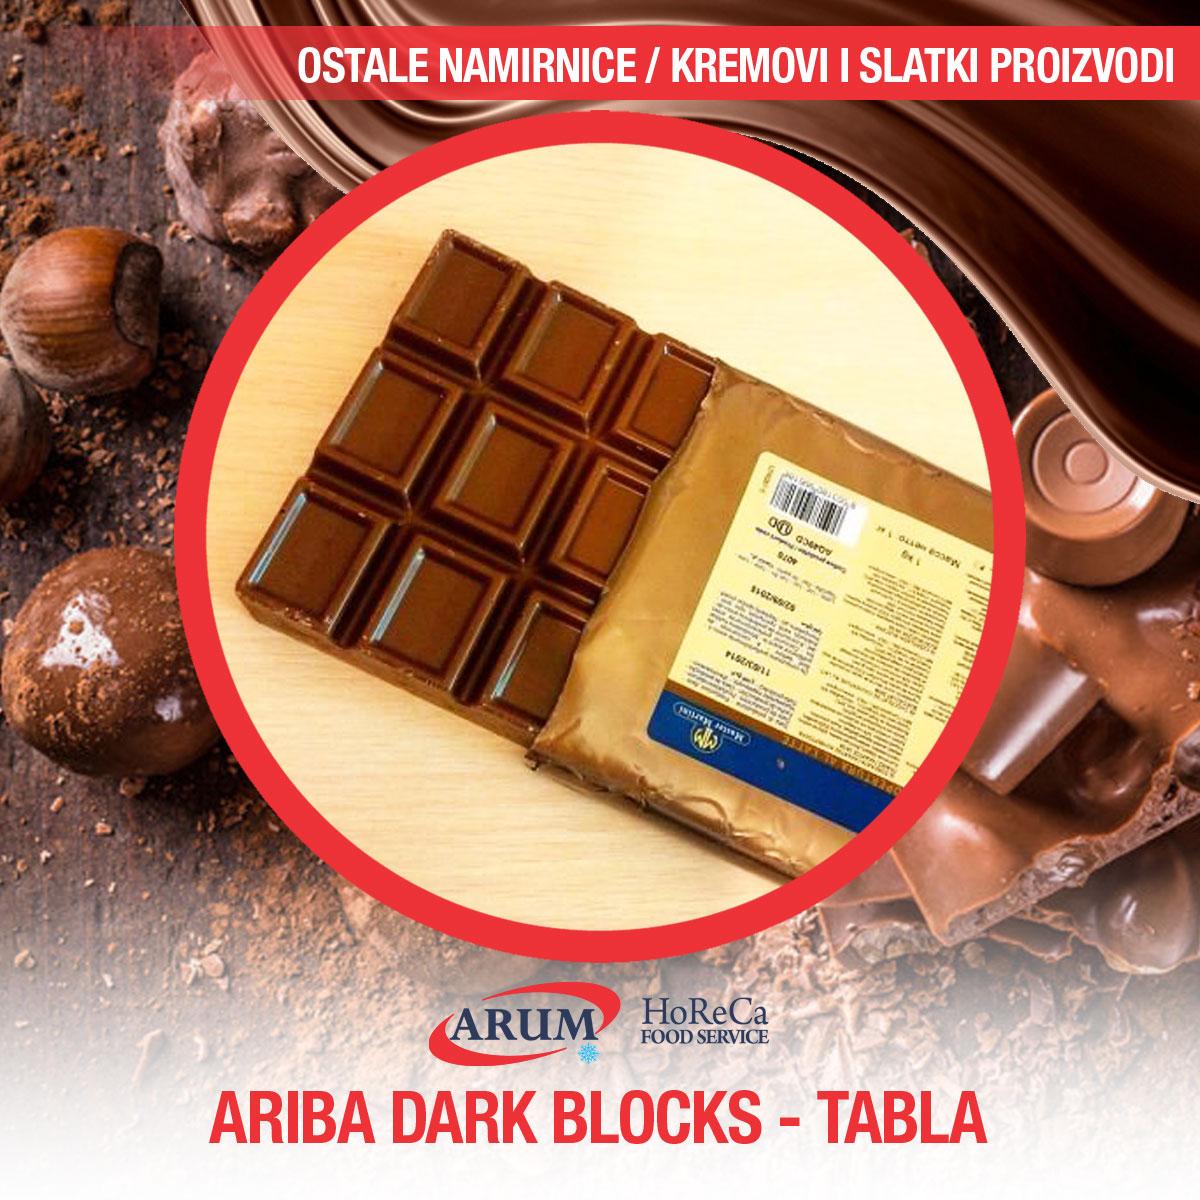 Ariba dark blocks - tabla 1kg